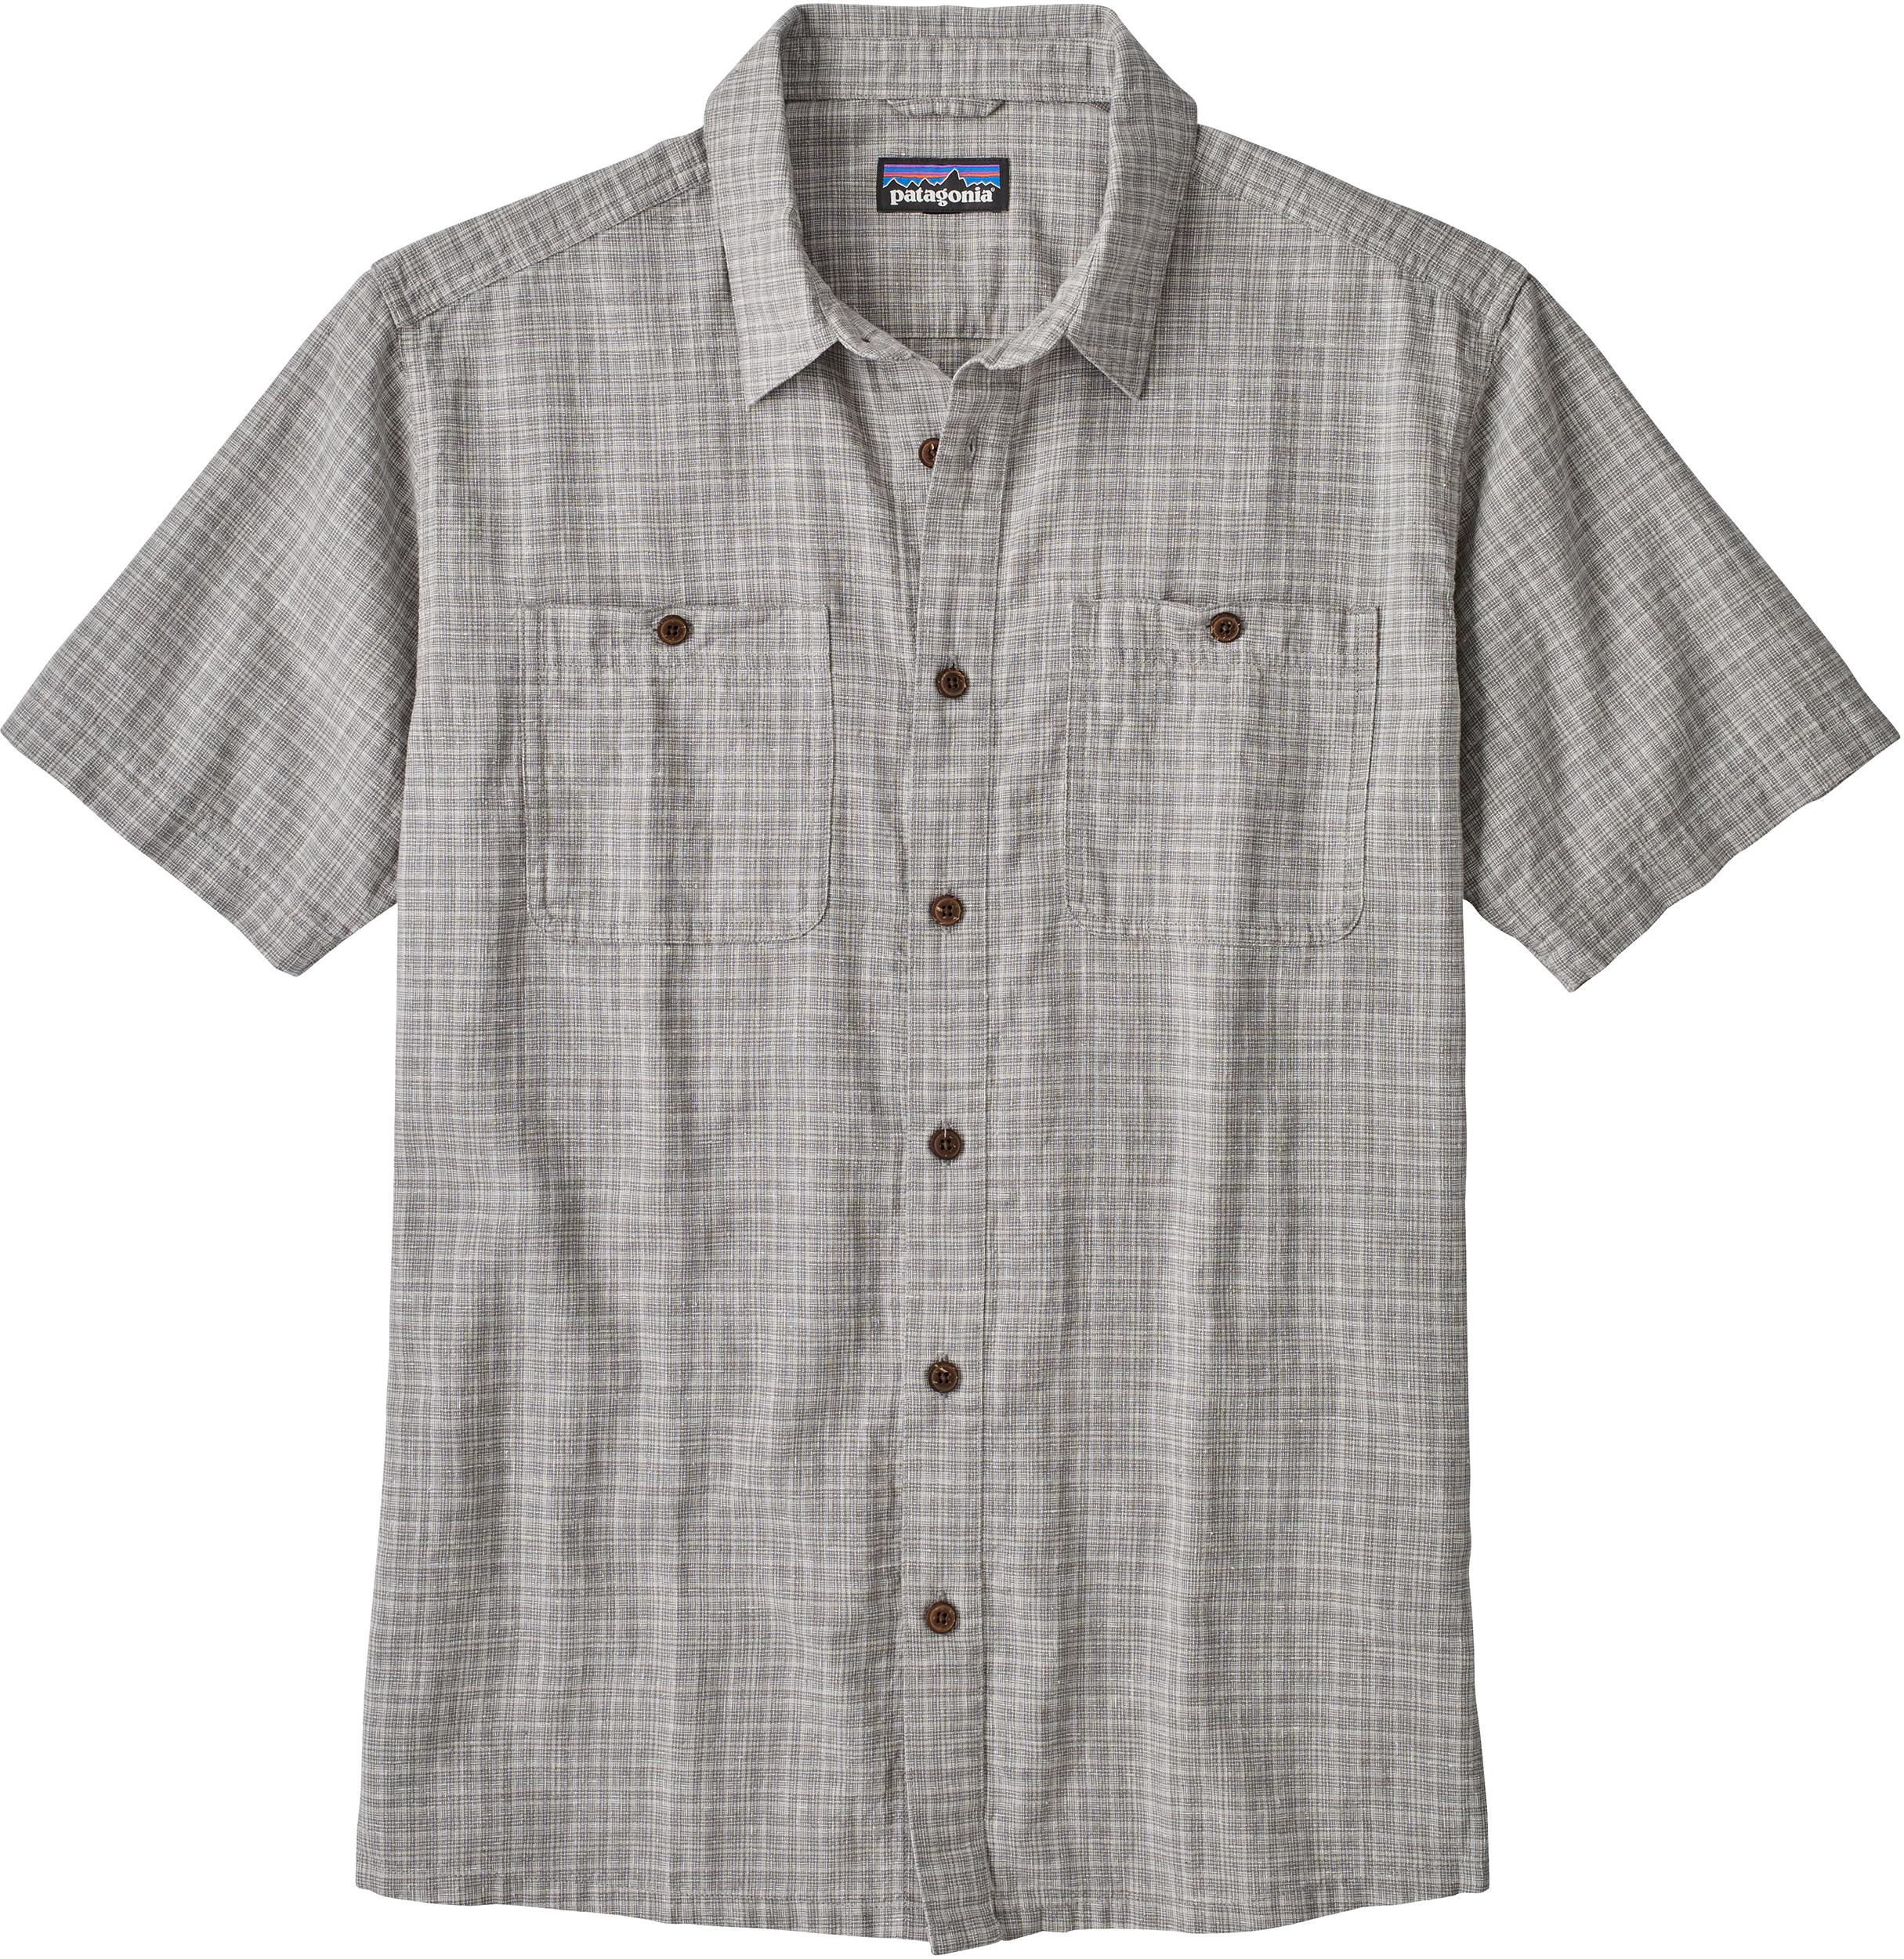 Undershirt Showing Dress Shirt Kamos T Shirt